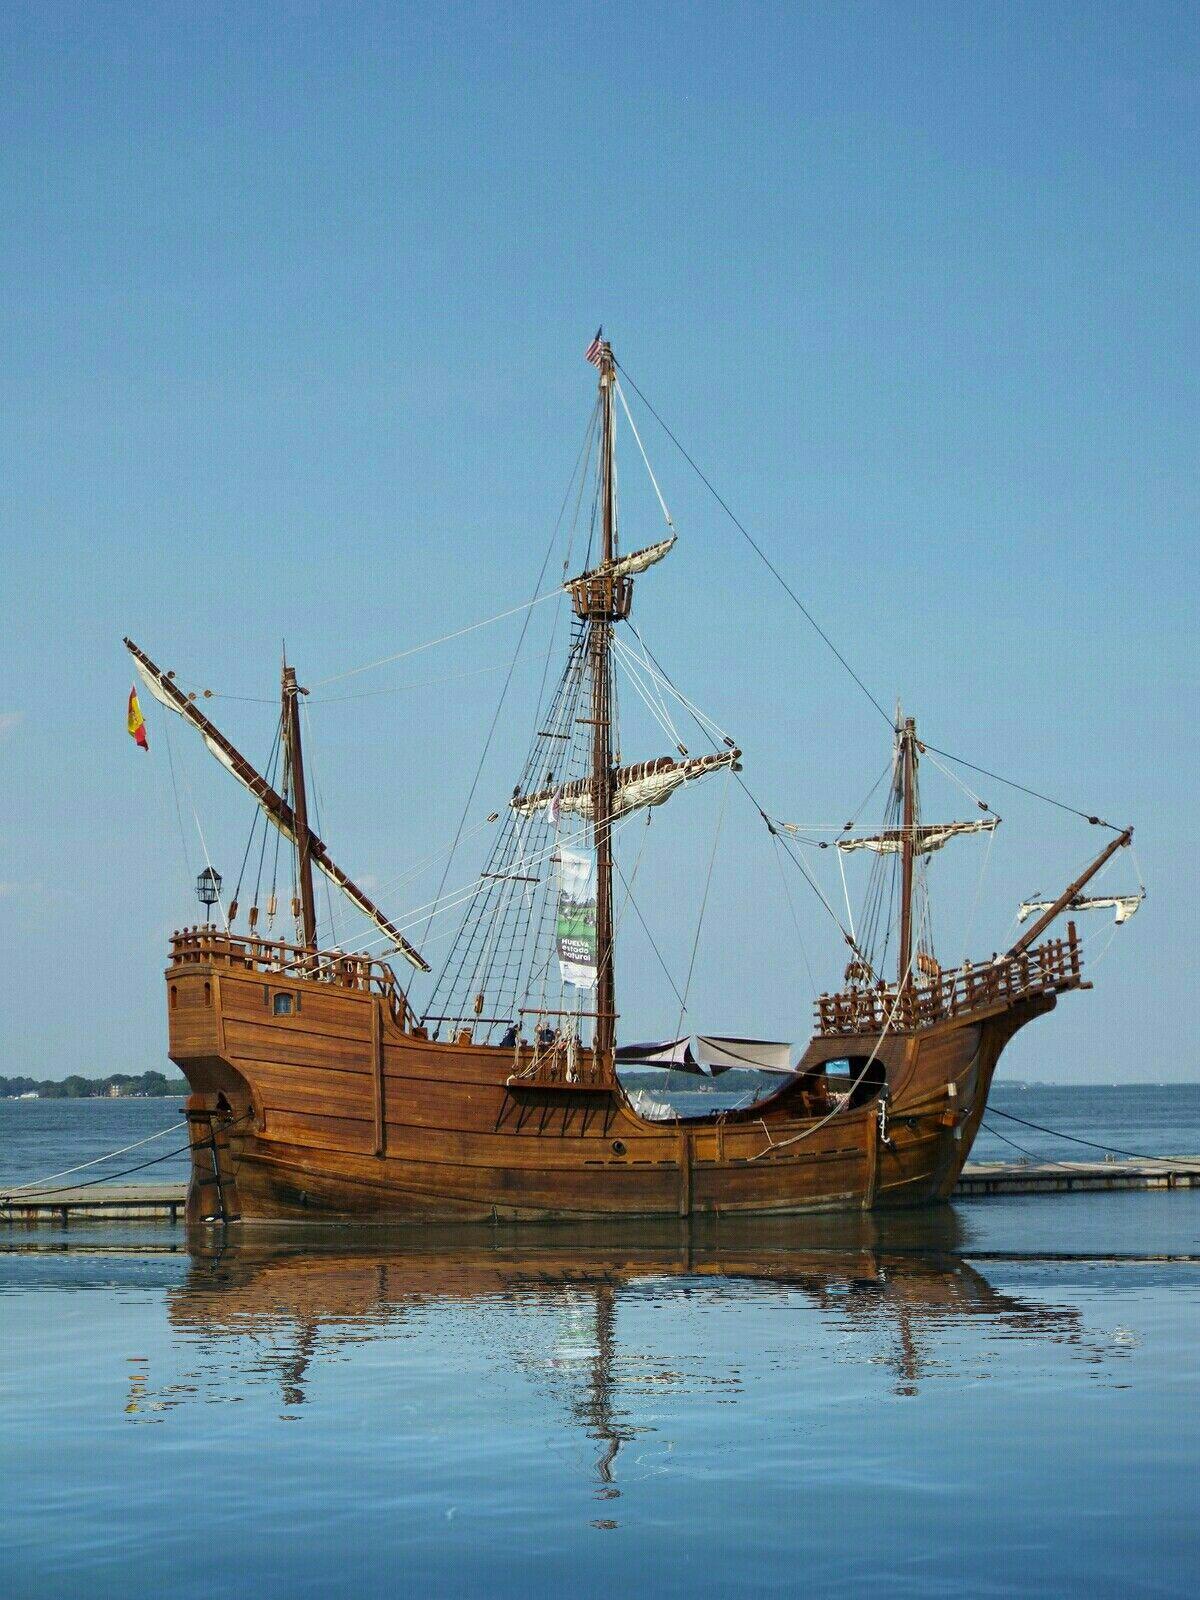 Pin By Ttc Media On The Santa Maria Christopher Columbus Flag Ship Sailing Christopher Columbus Sailing Ships